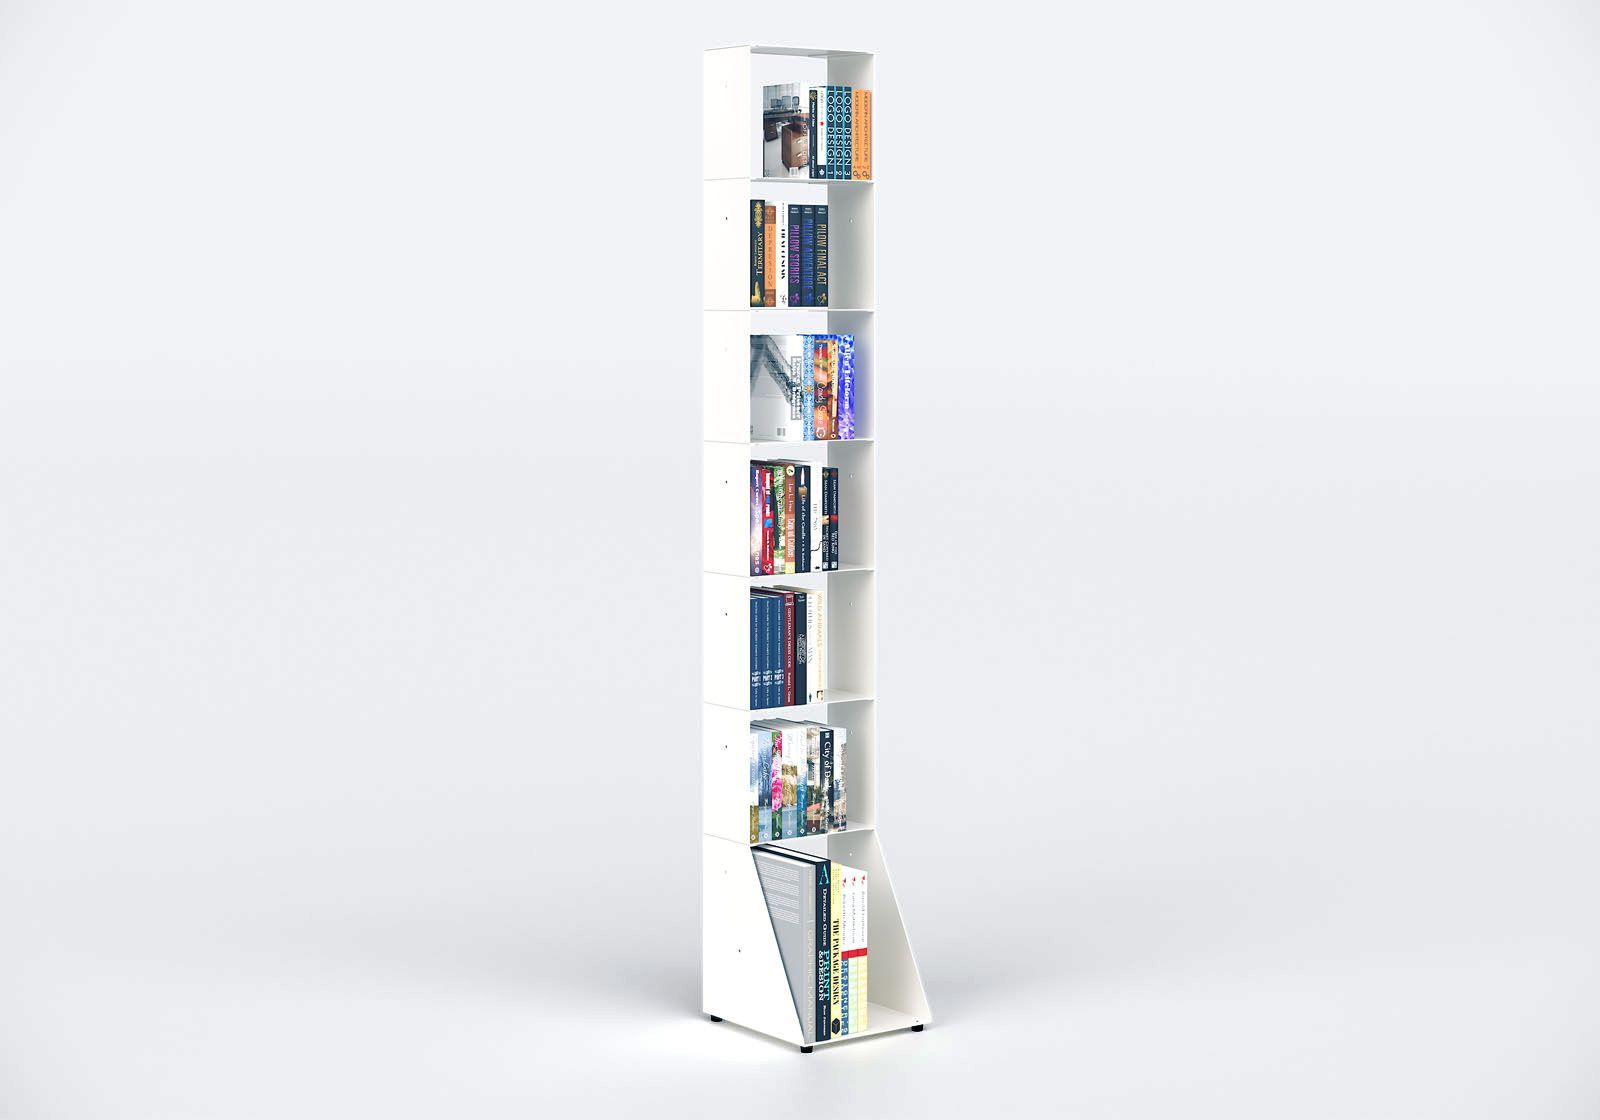 Librerias muebles 30 cm - metal blanco - 7 niveles